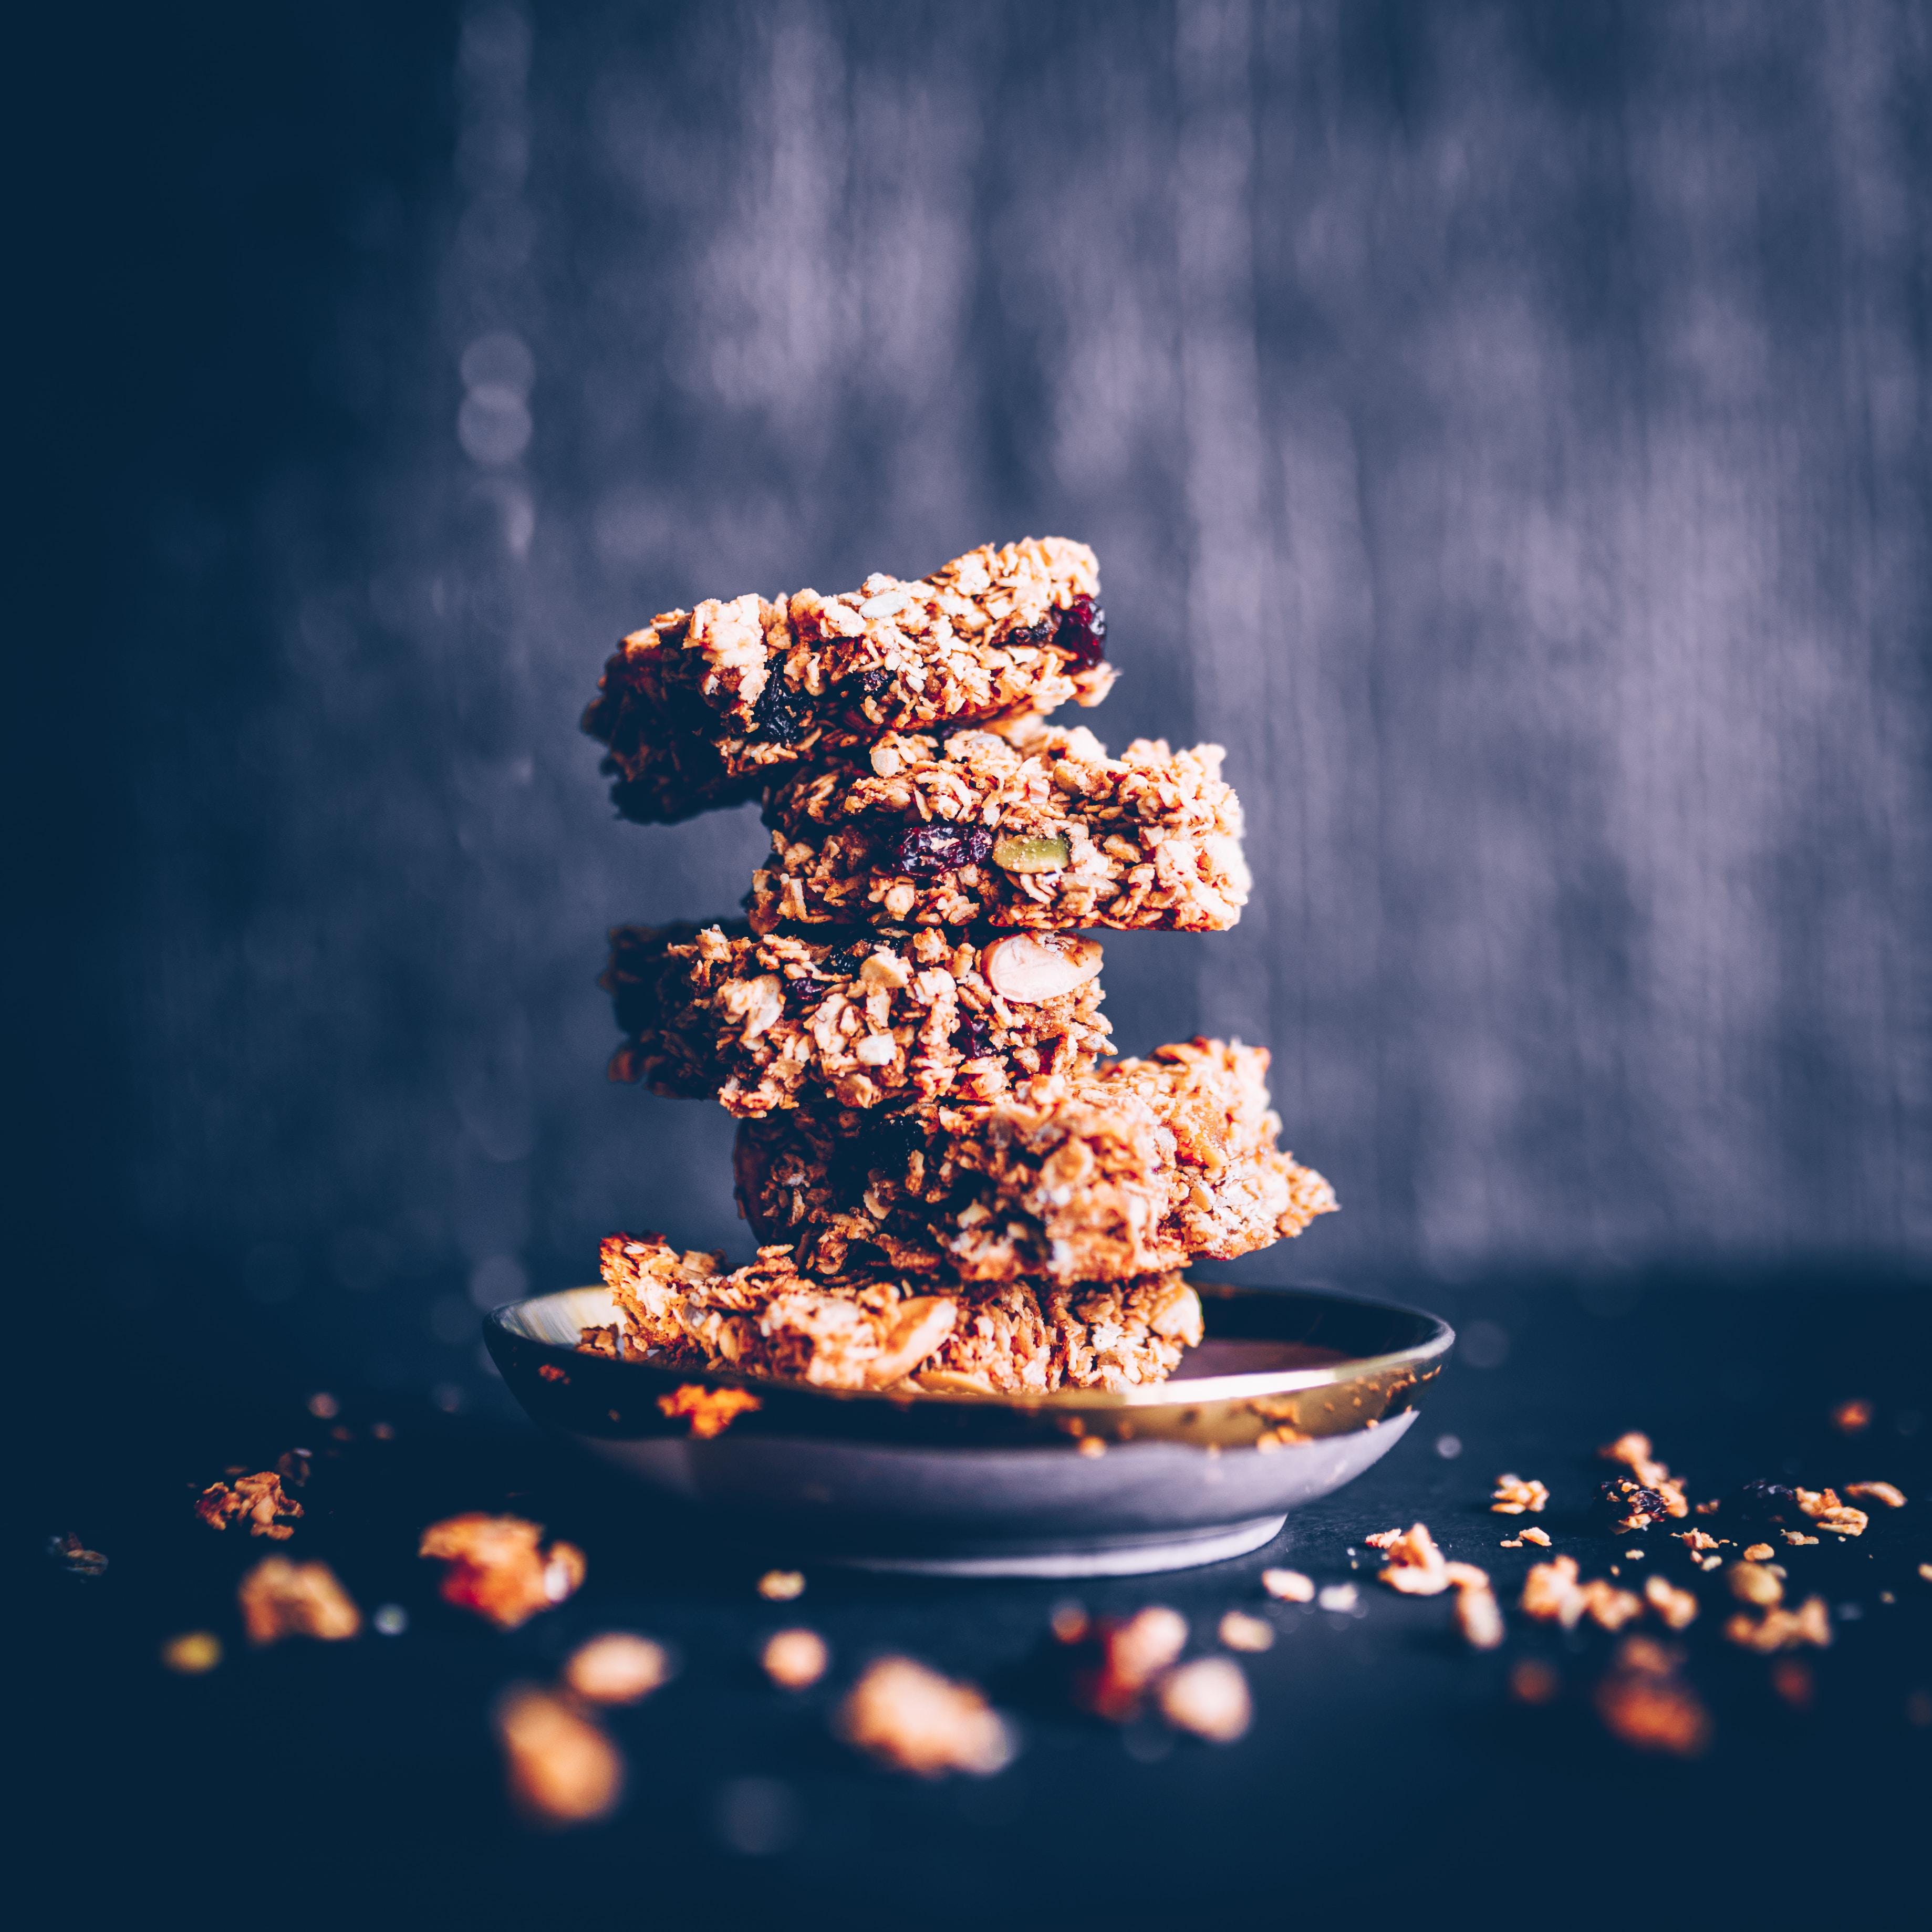 homemade granola bars with seeds and raisins